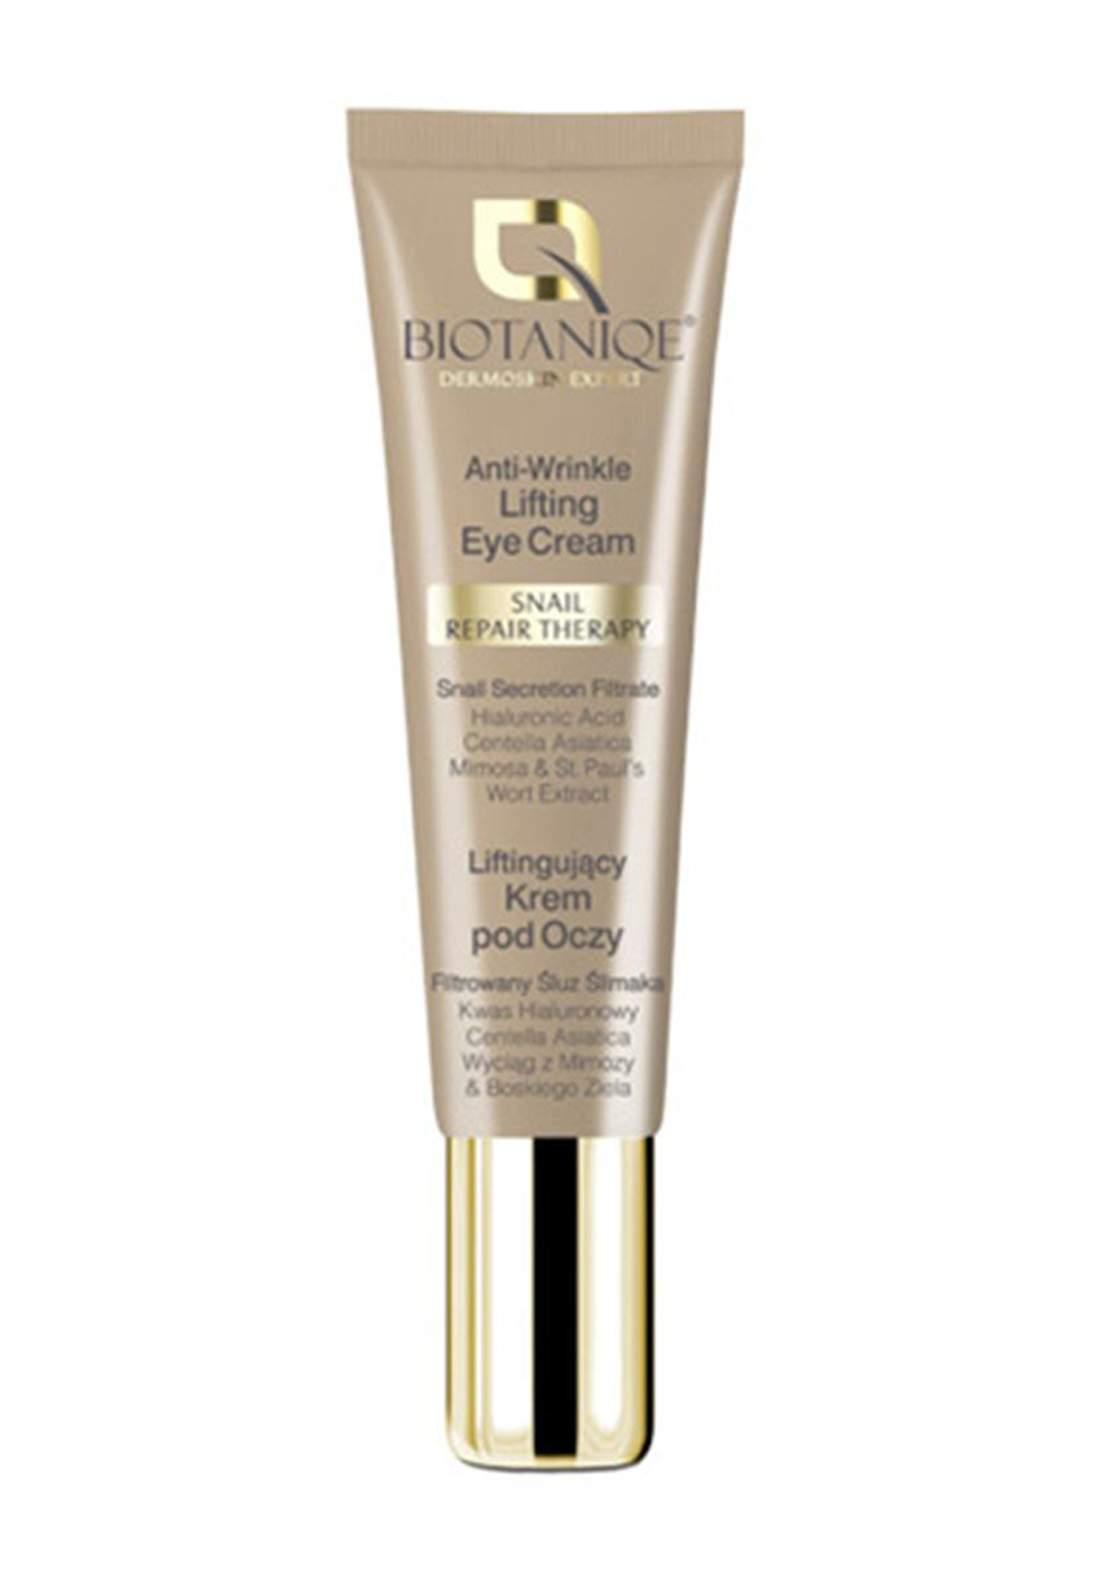 Biotaniqe  Anti-Wrinkle Lifting Eye Cream 15ml كريم شد و معالجة التجاعيد حول العين